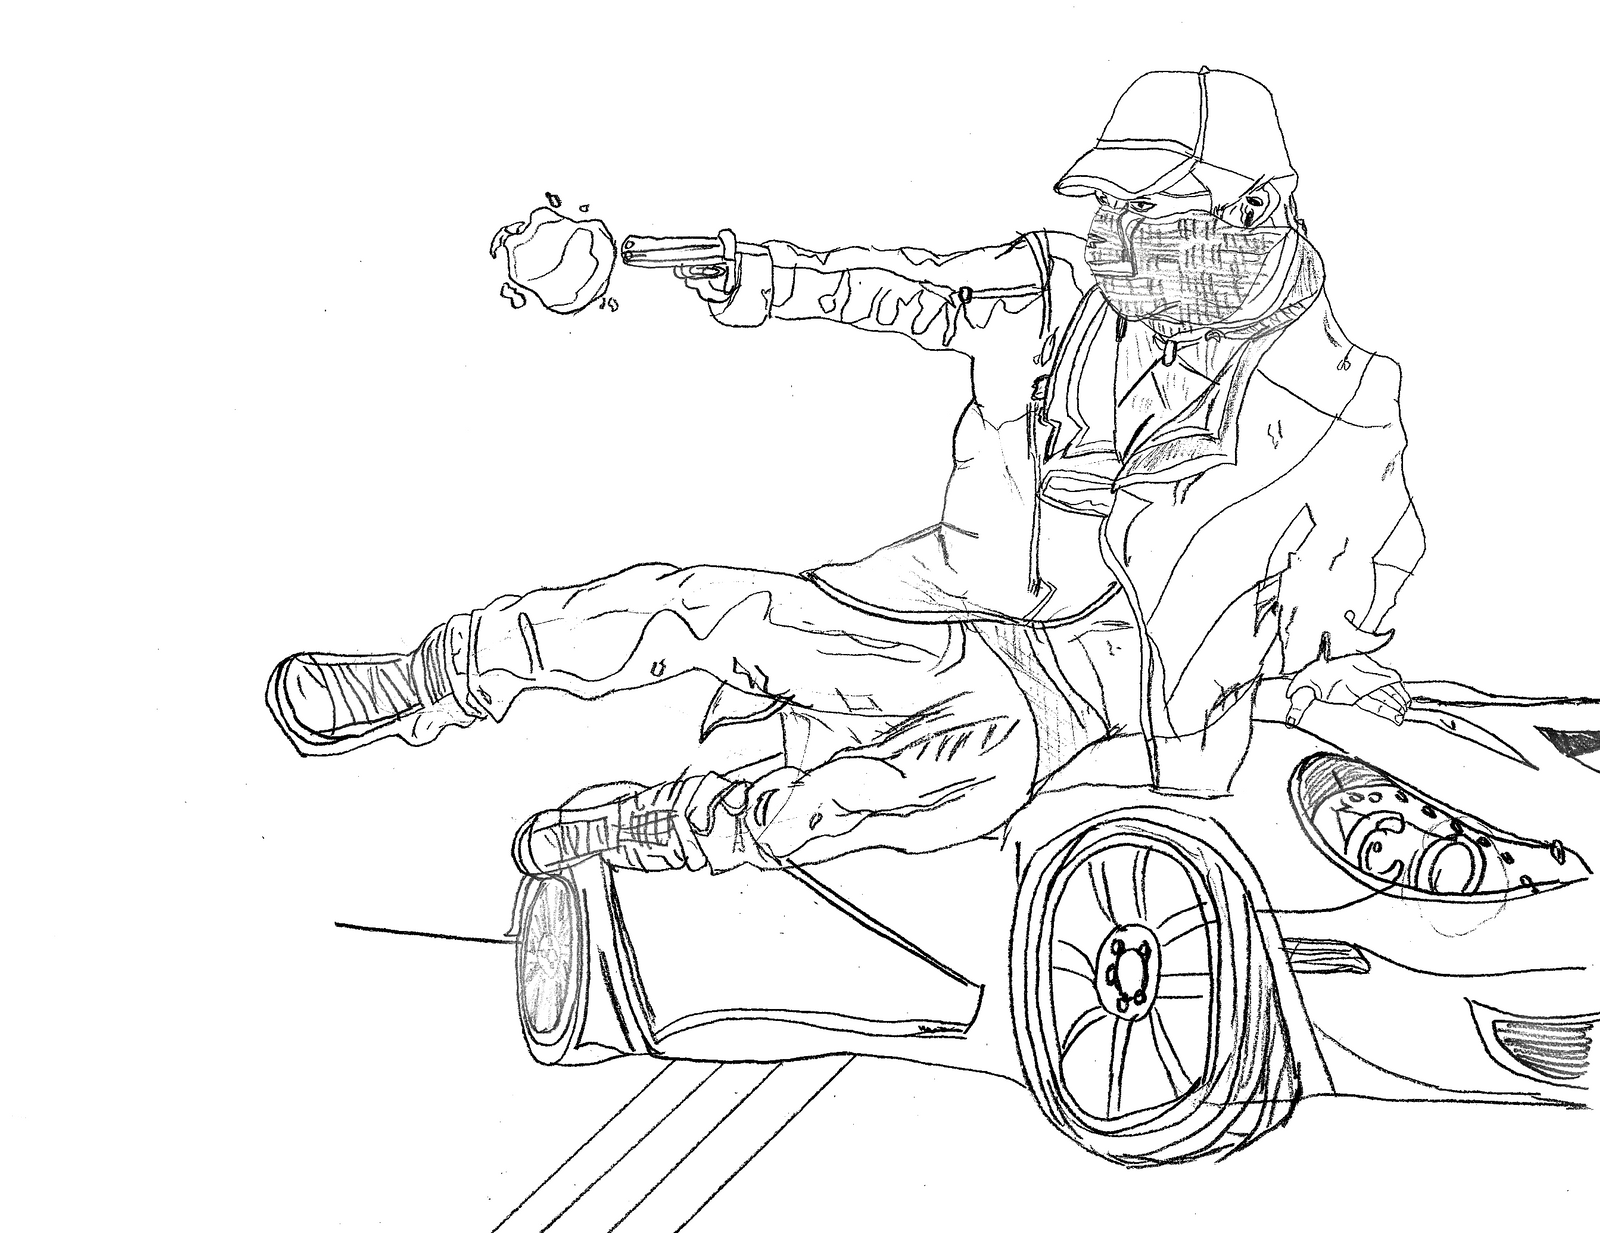 Watch Dogs Aiden Pearce Drawing By LegendaryRey On DeviantArt